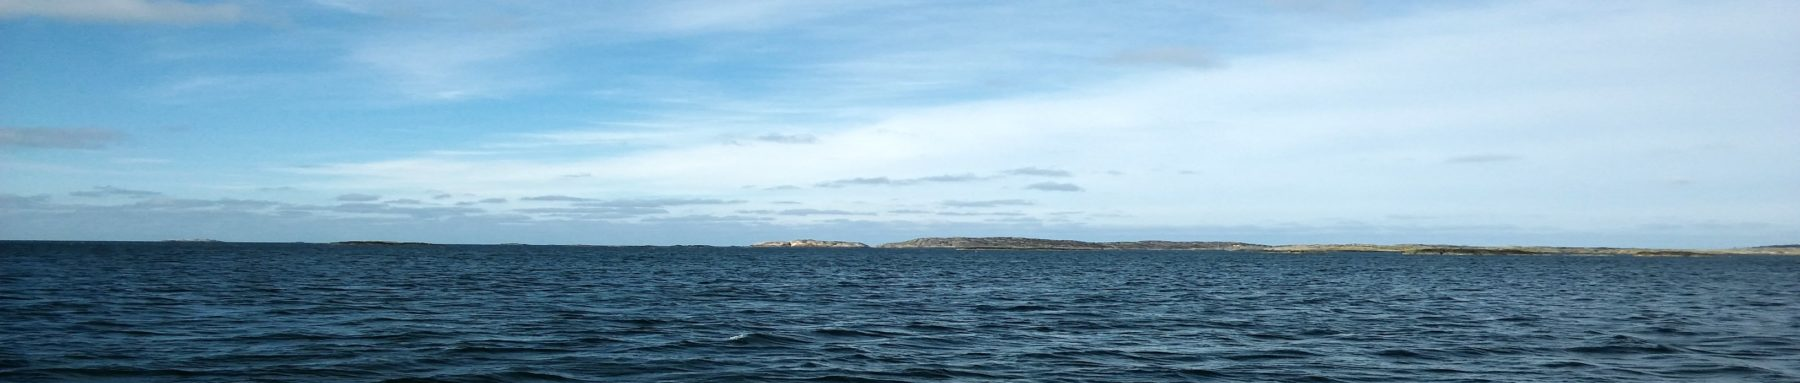 Westberg marin